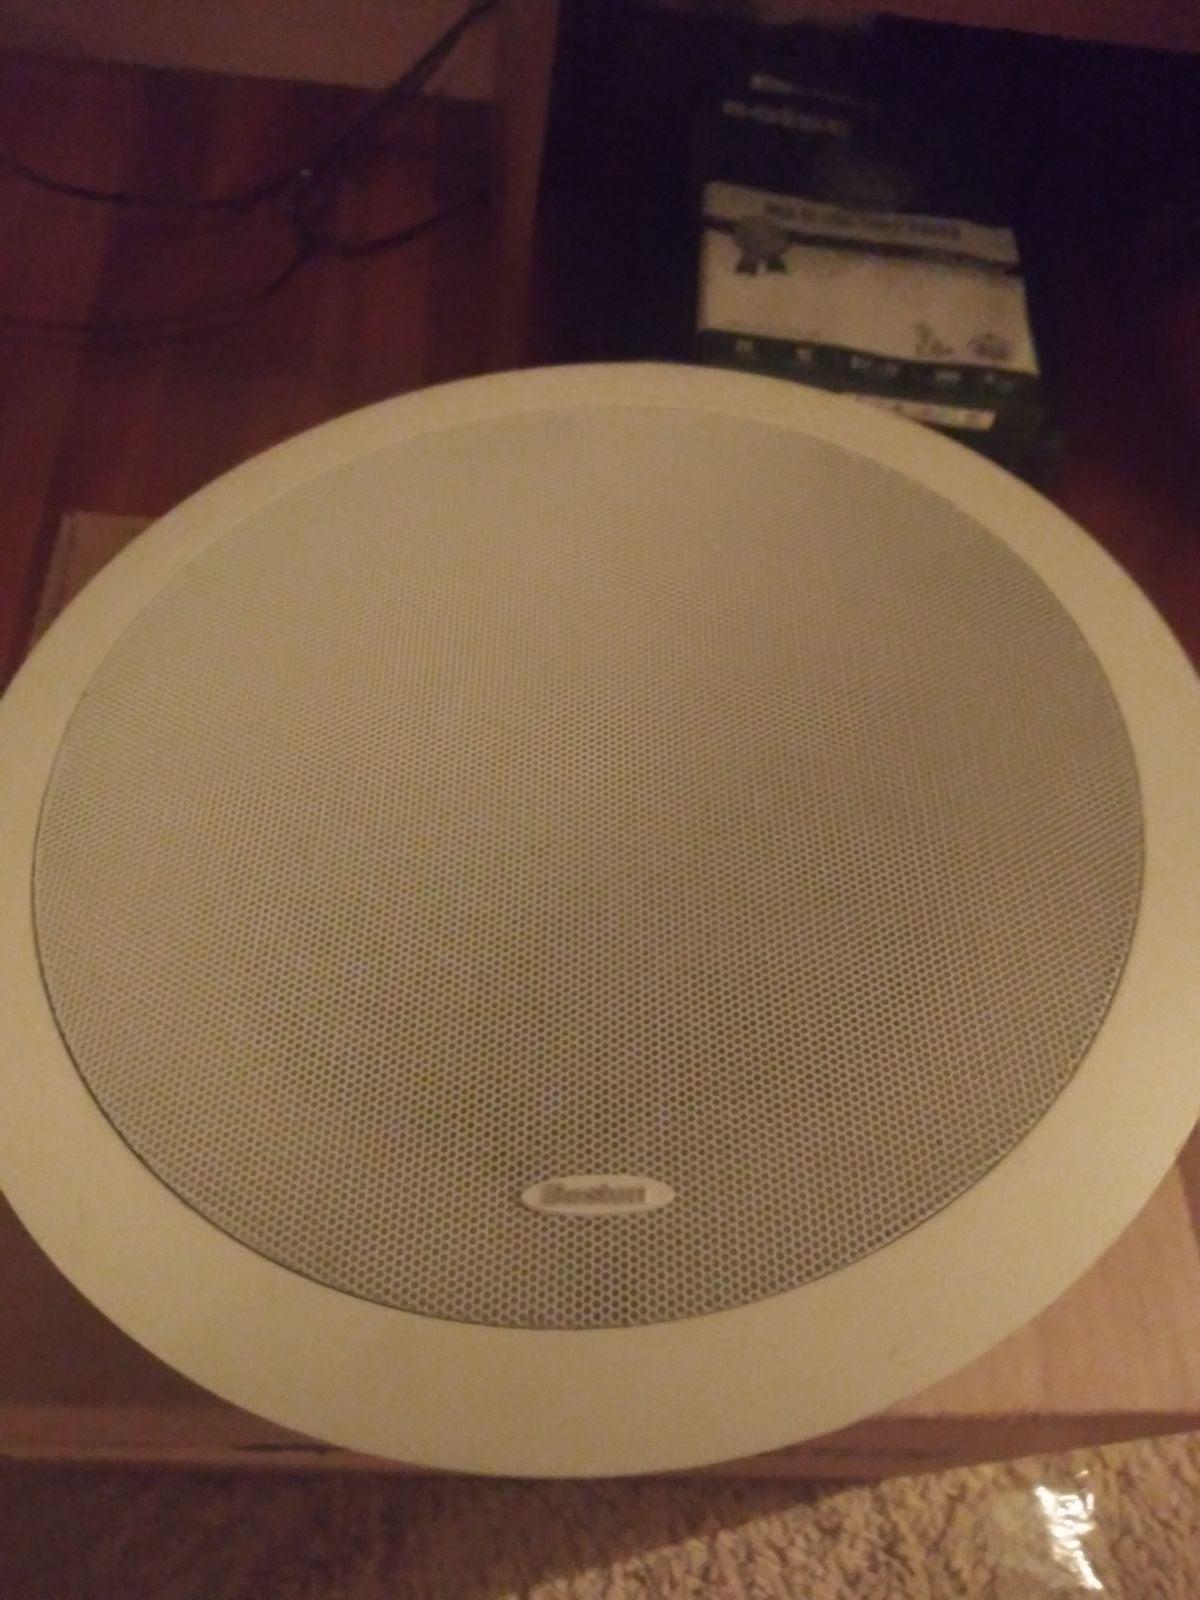 Boston Acoustic DSi485 8 2Way Speakers